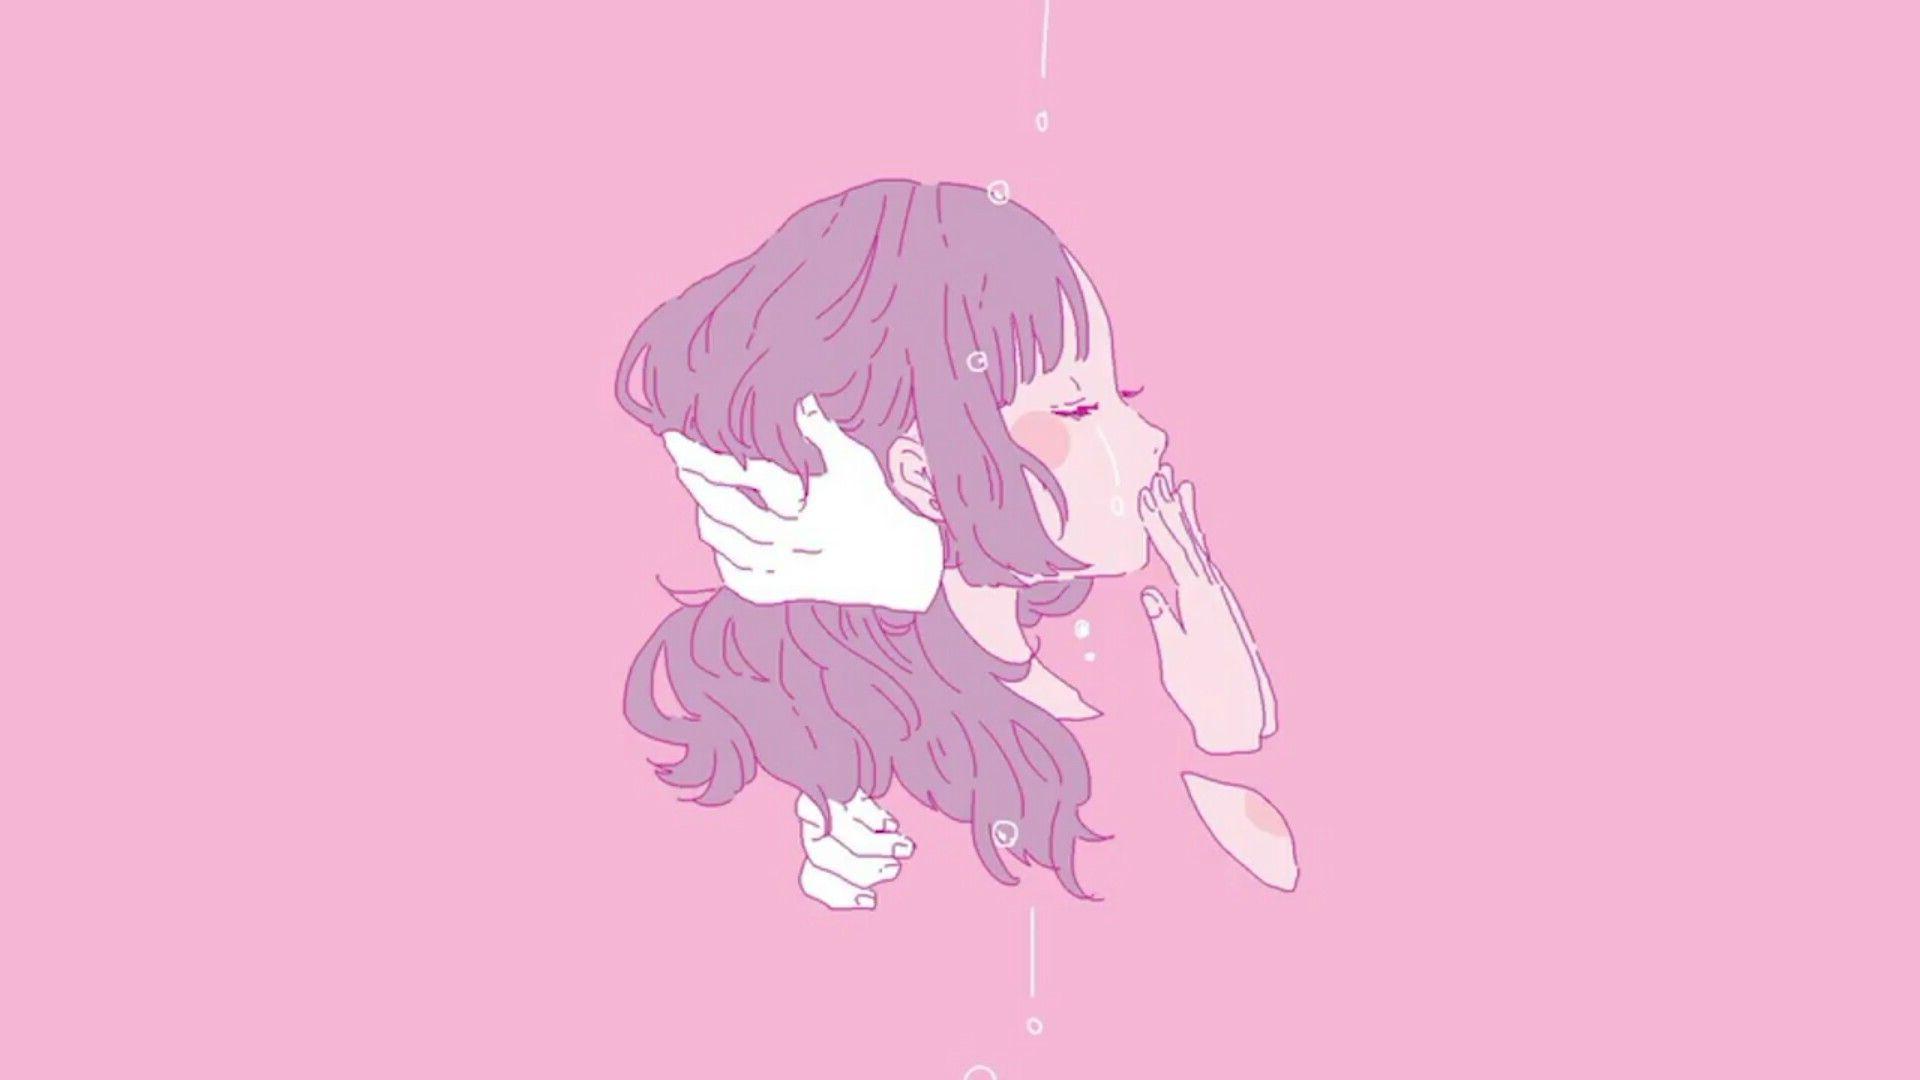 Cute Aesthetic Anime Girl Desktop Wallpapers Wallpaper Cave